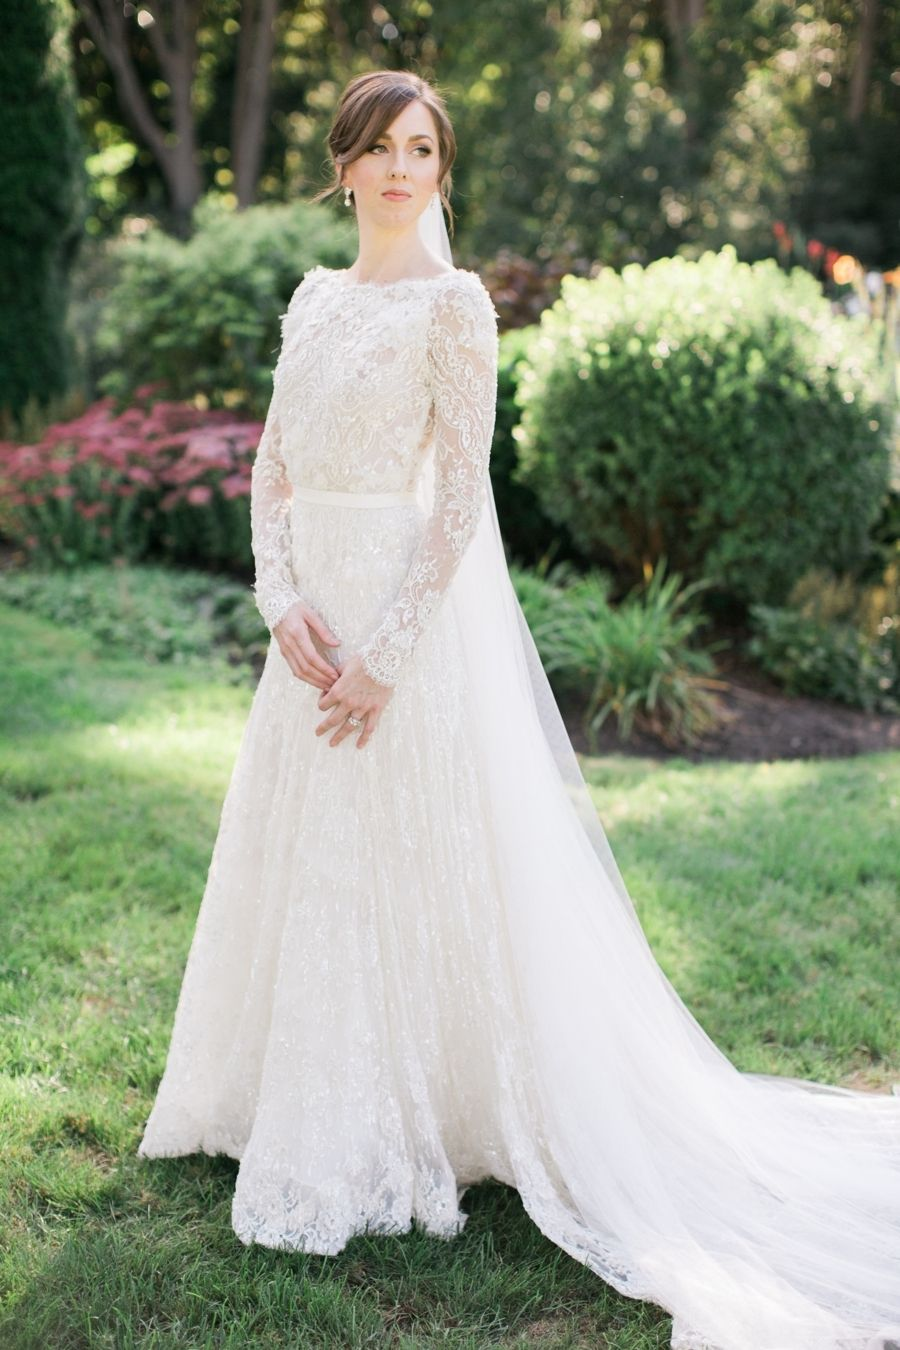 22 Photos Every Bride Needs of Her Wedding Dress   Hochzeitsfotos ...